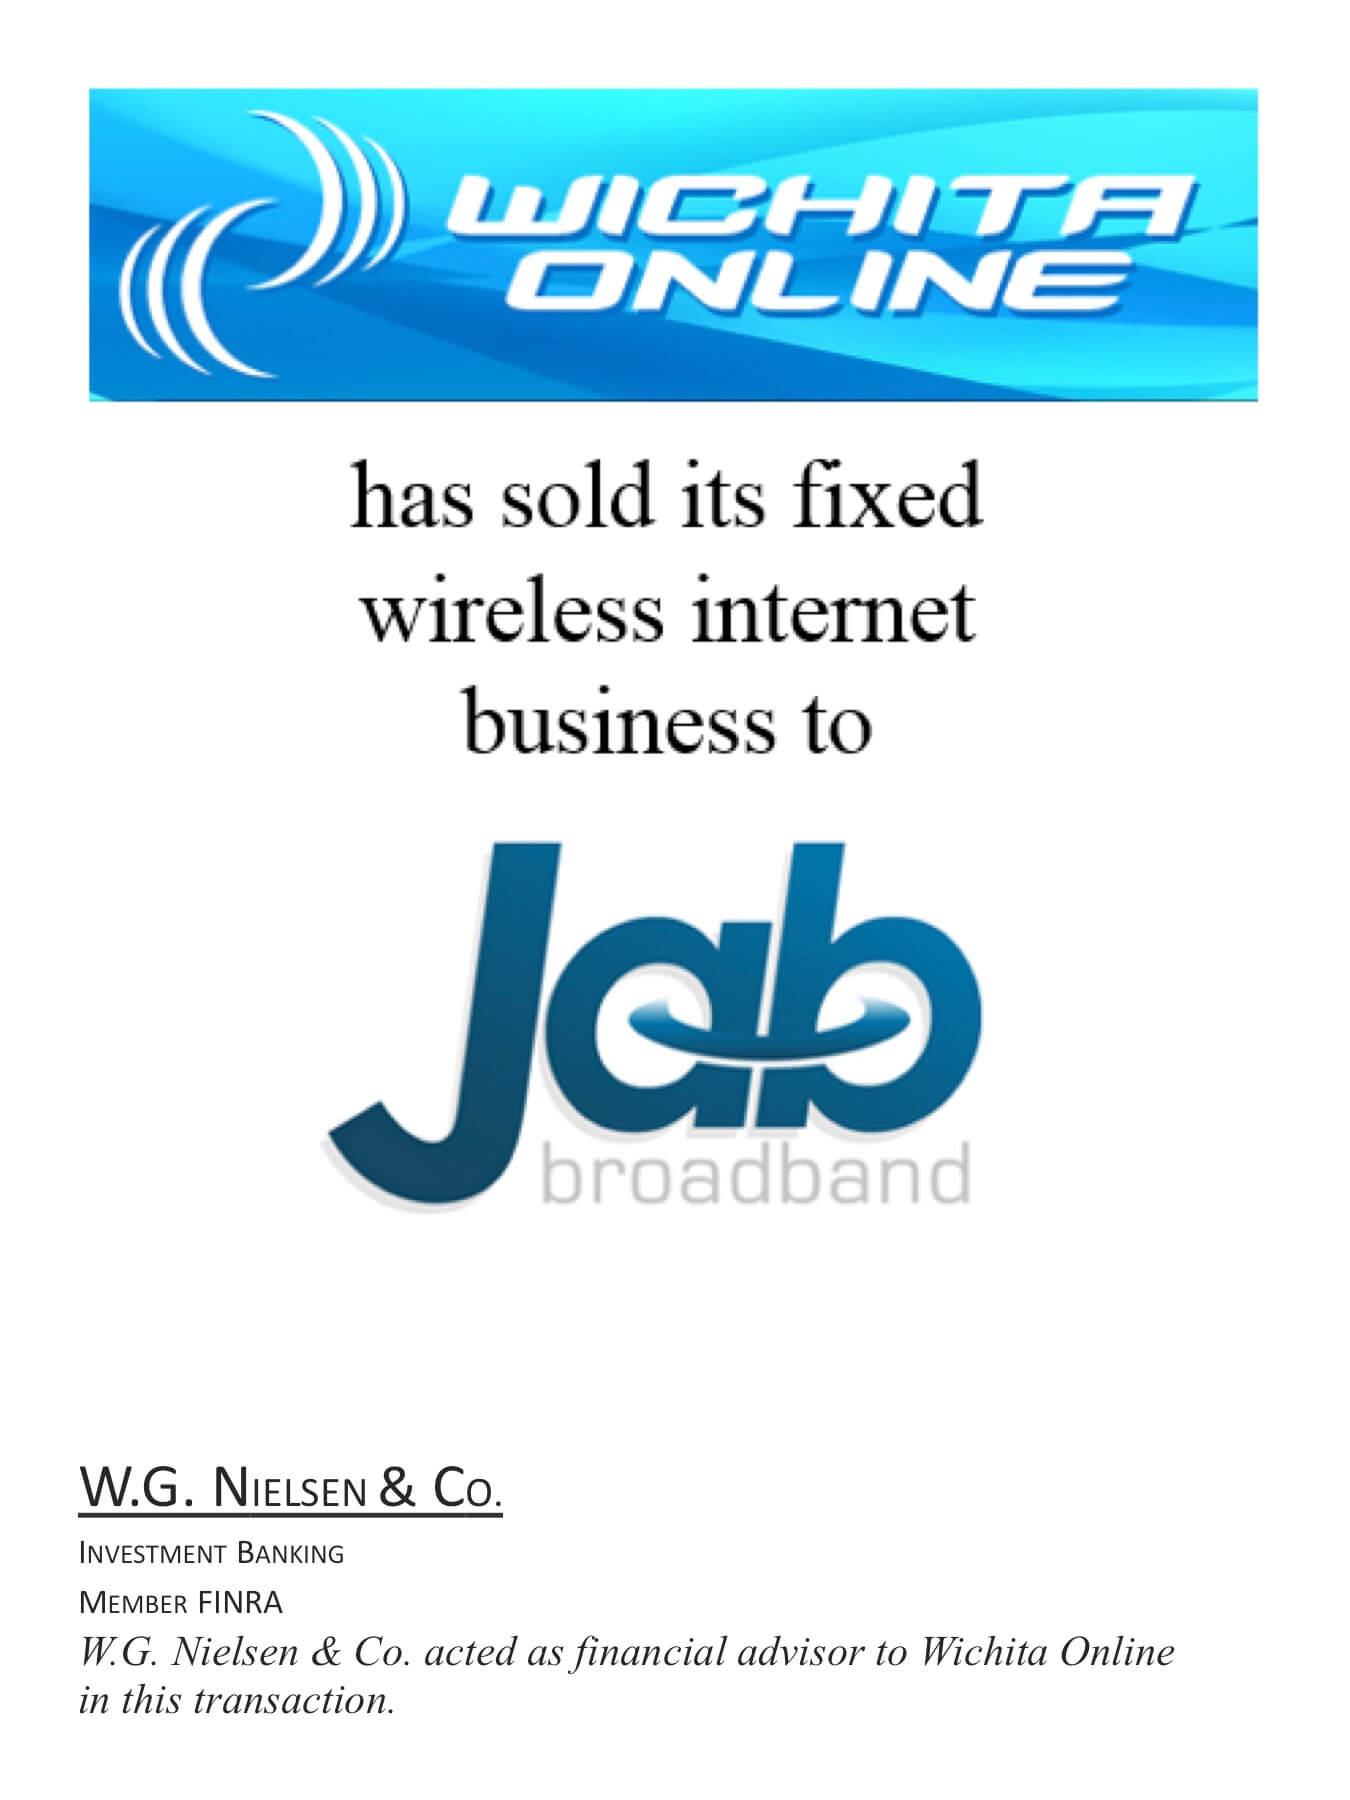 wichita online investment banking transaction